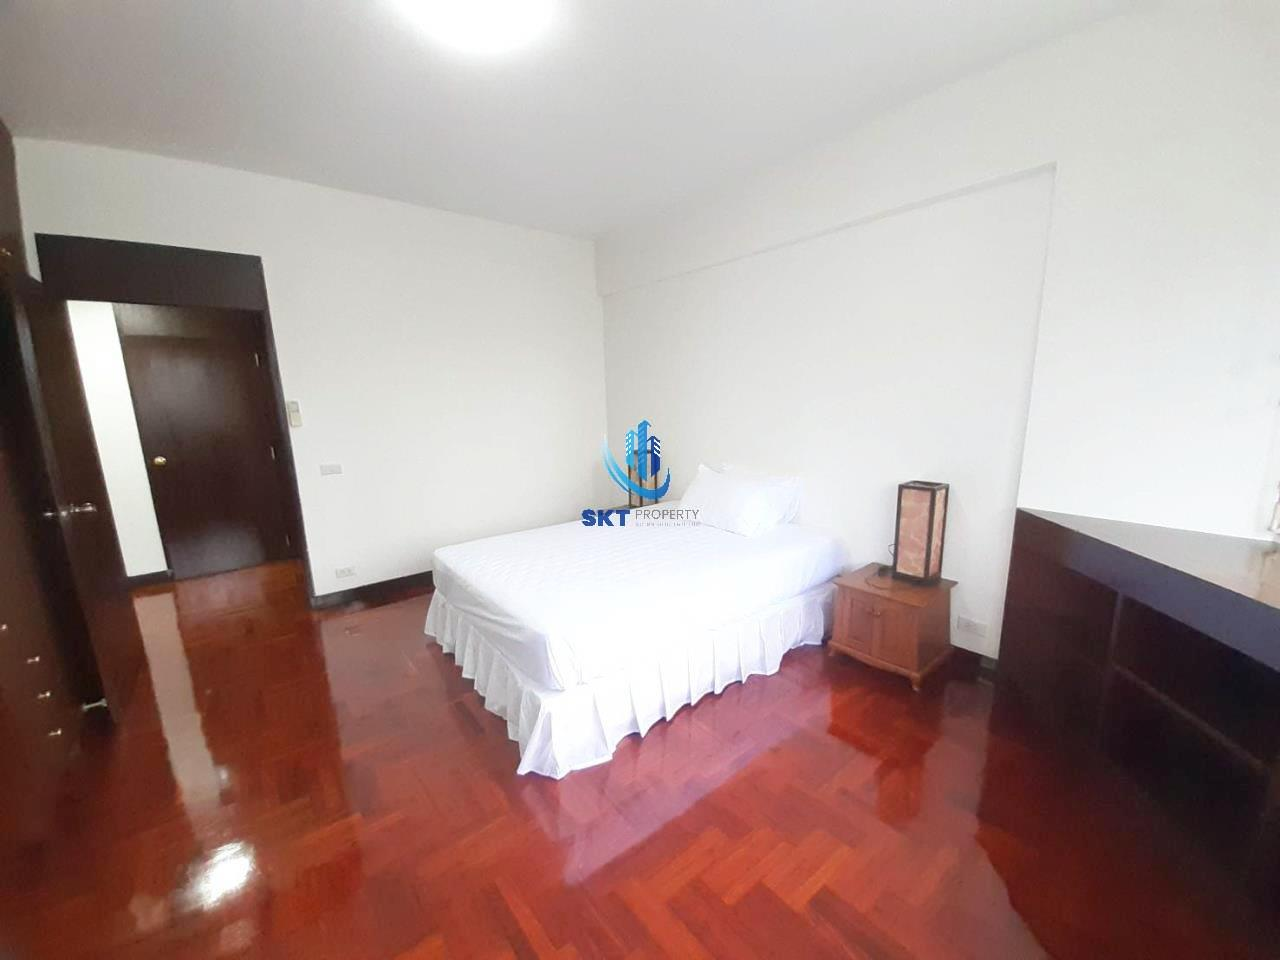 Sukritta Property Agency's Kanta mansion sukhumvit 26 - Bts Prompong 7